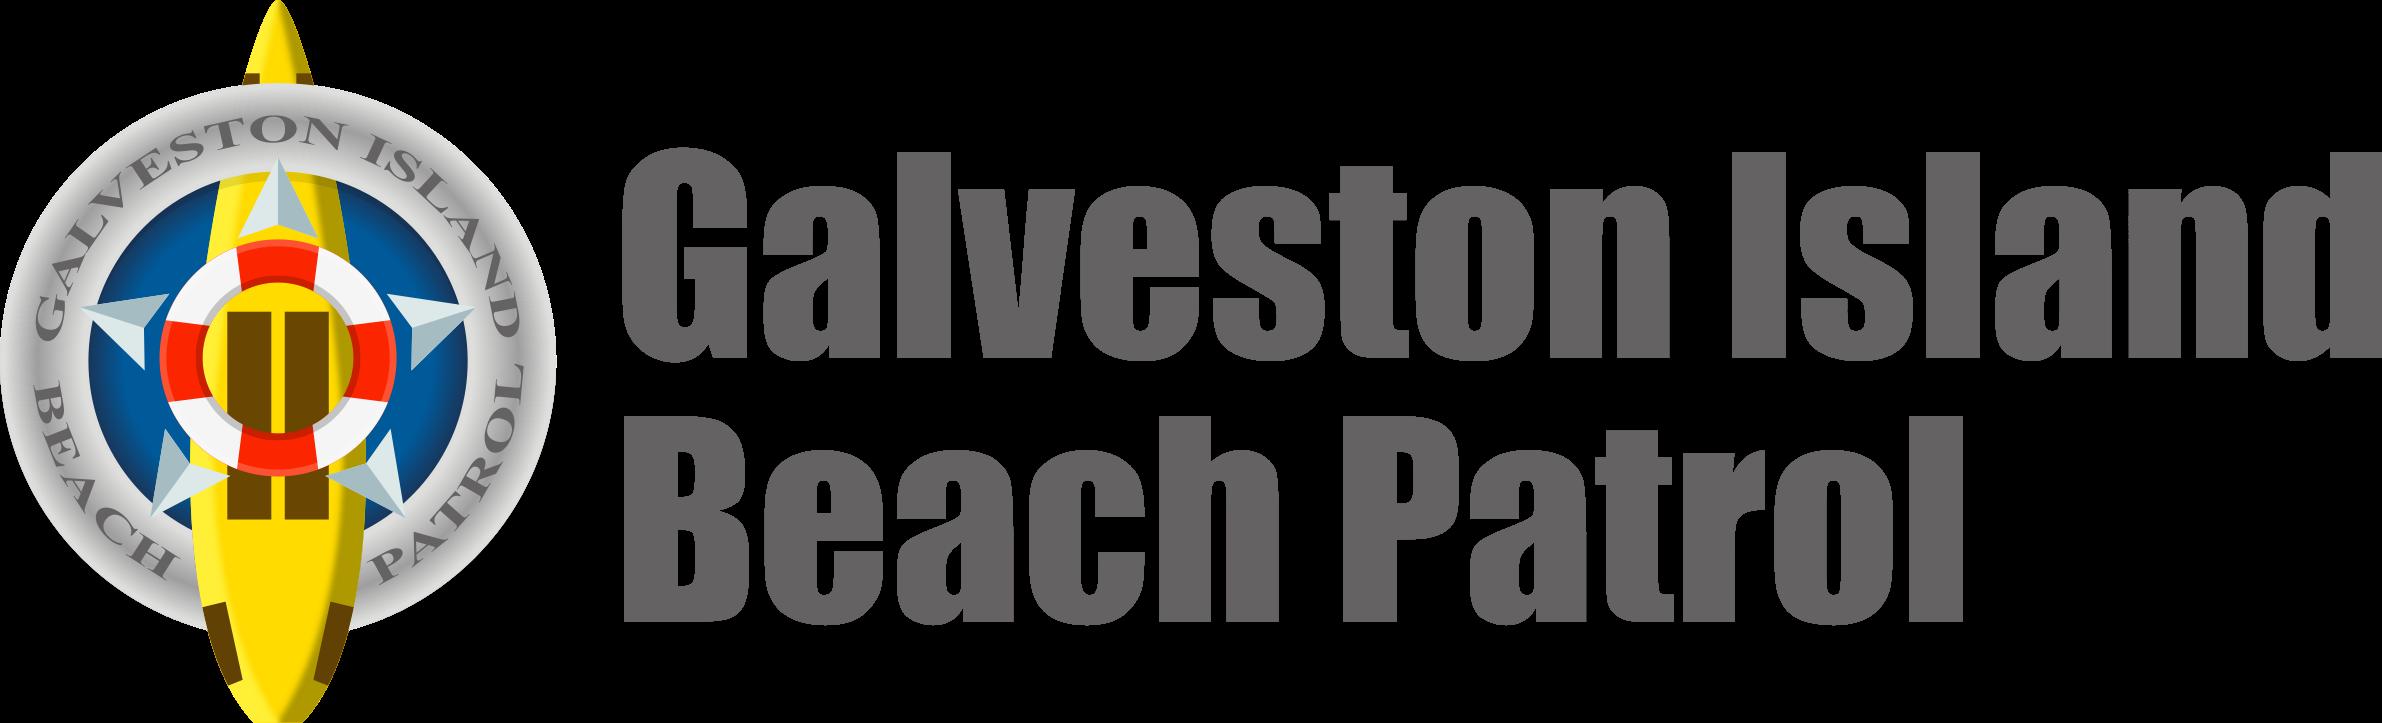 Galveston Island Beach Patrol